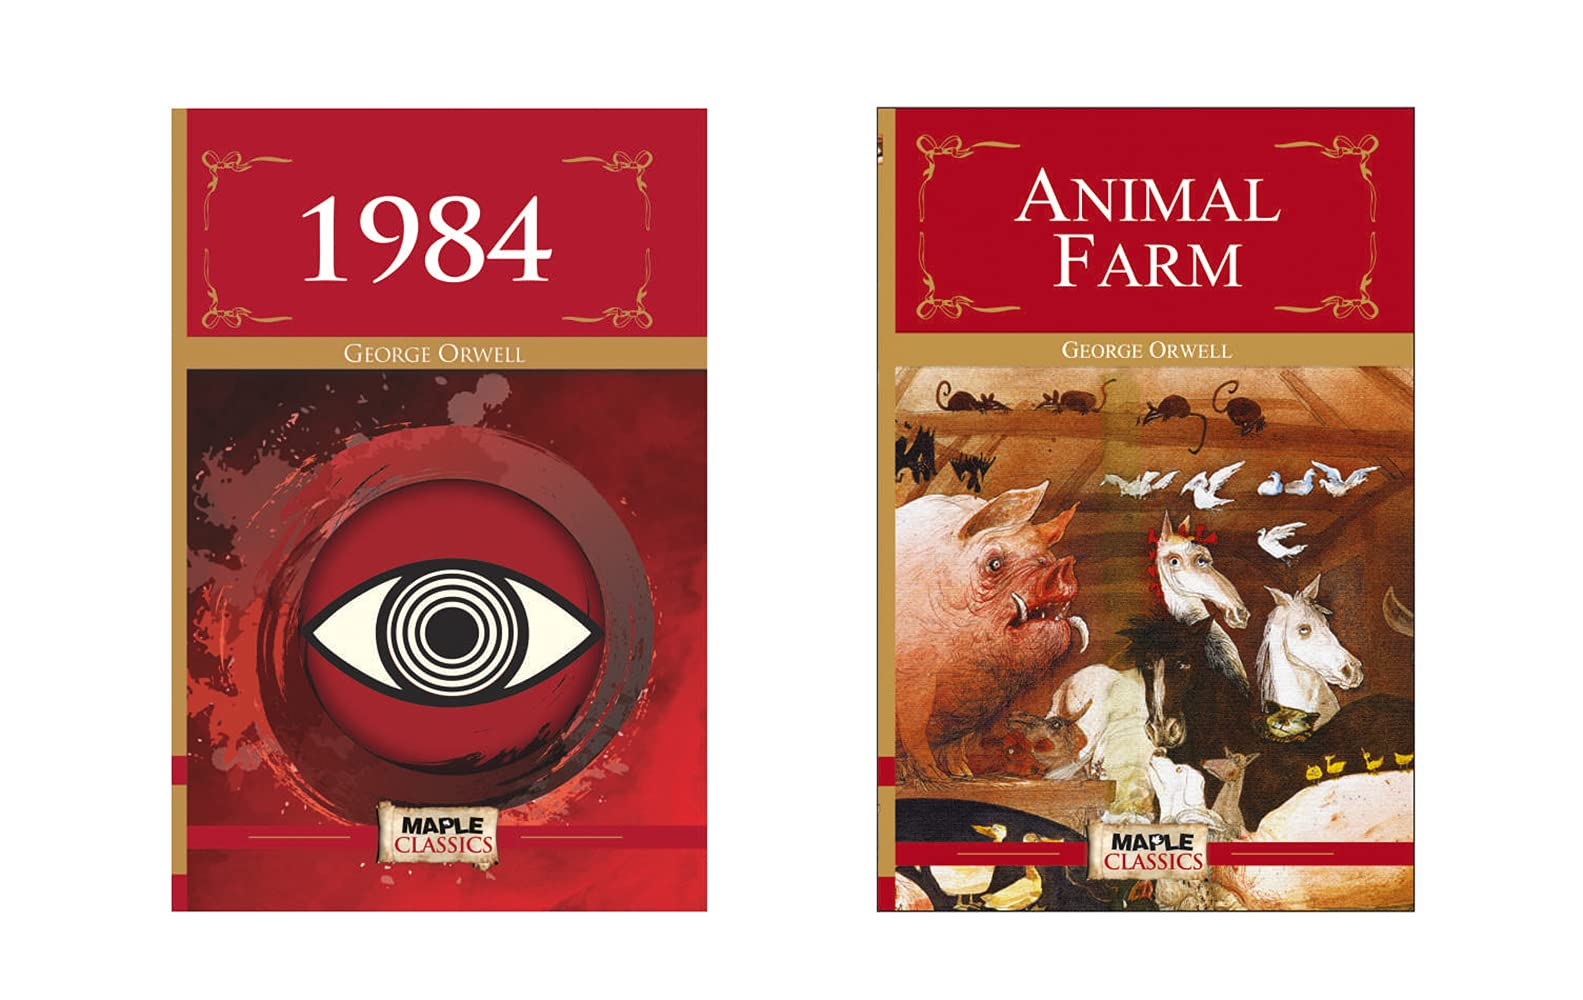 1984, Animal Farm (Set of 2 Books)